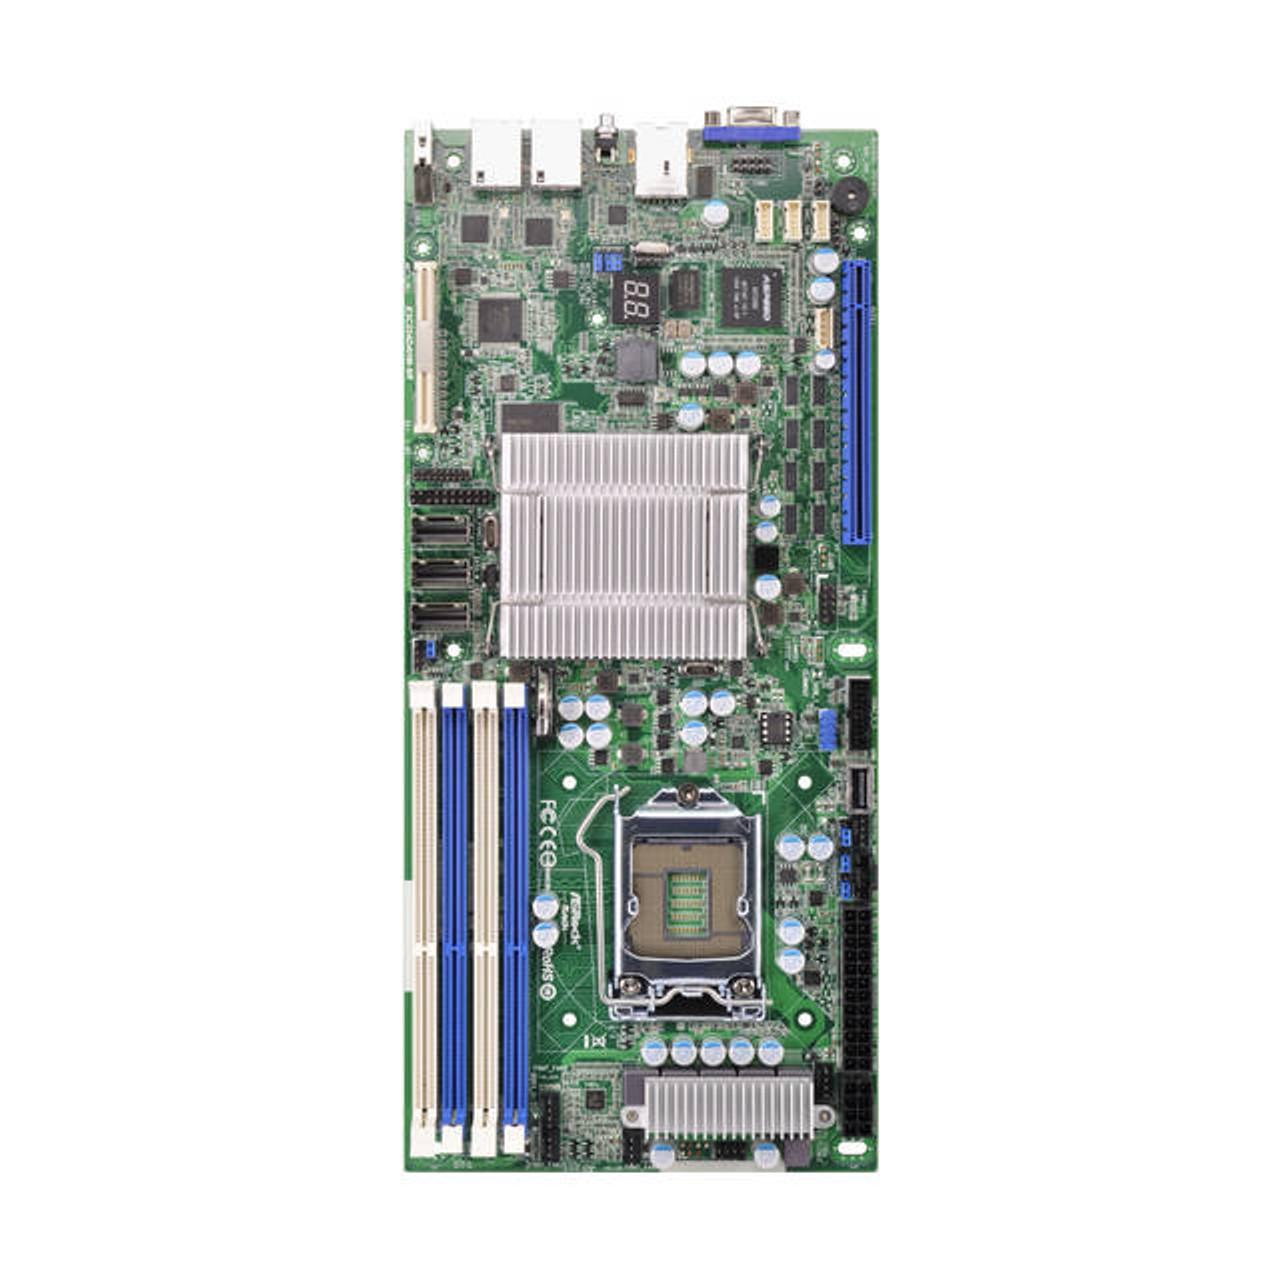 DRIVER UPDATE: ASROCK E3C224D2I INTEL LAN